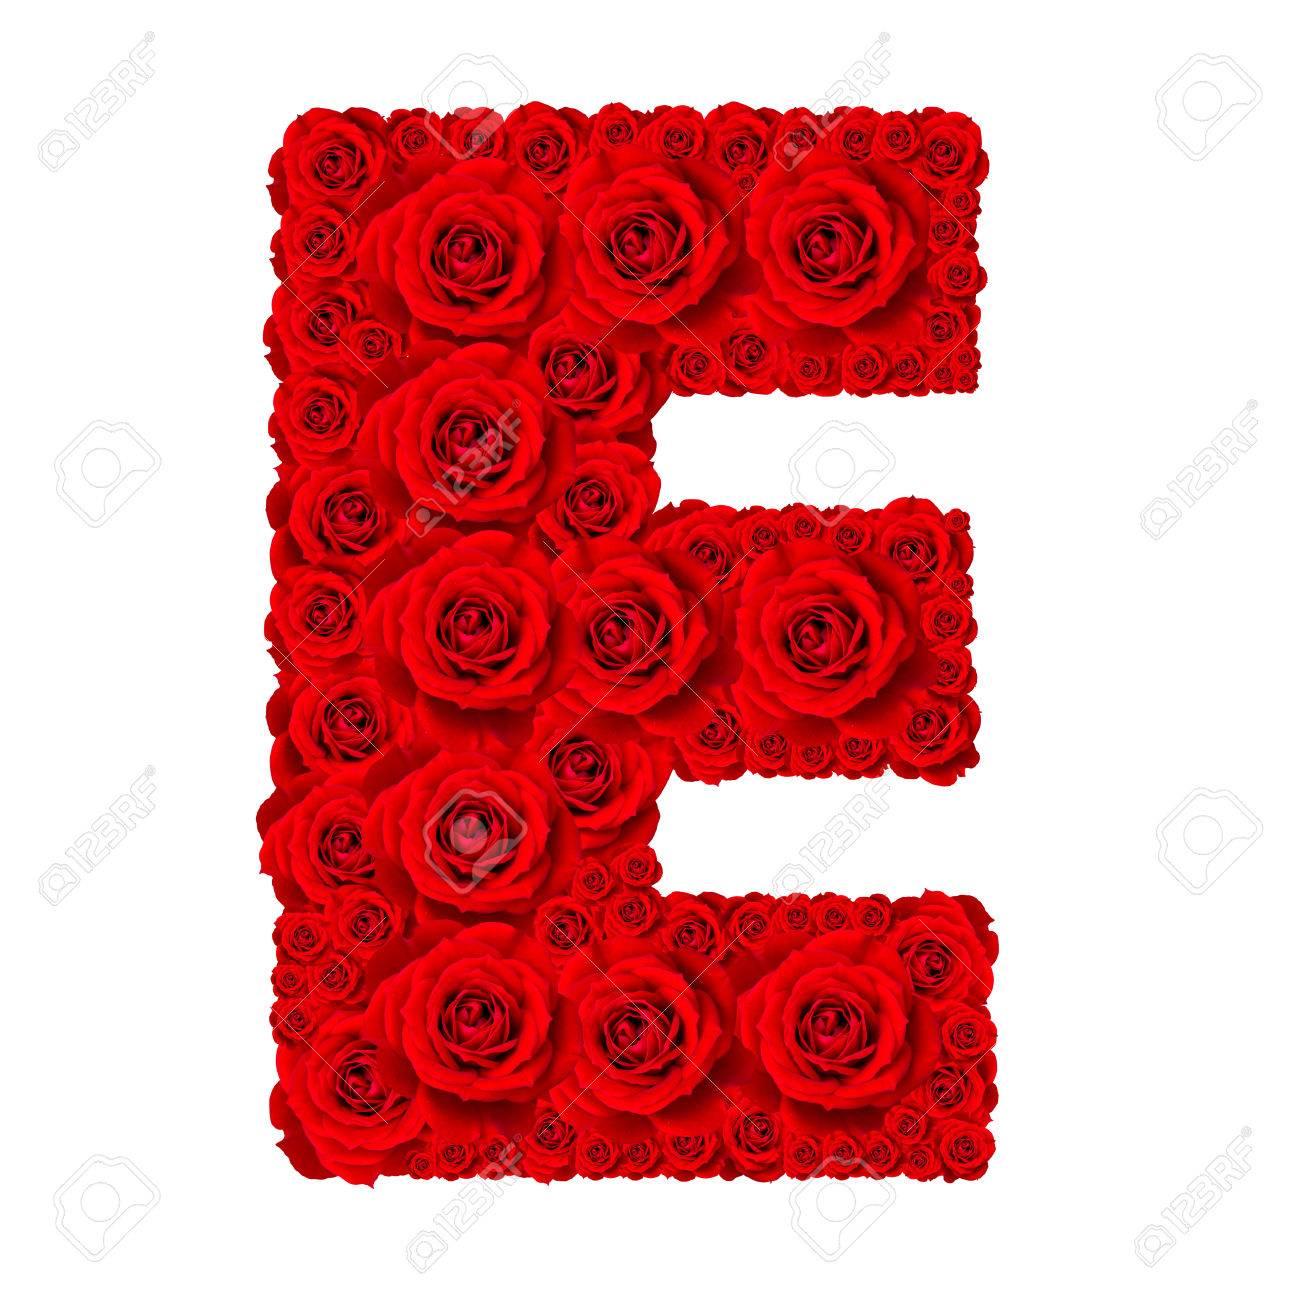 Rose alphabet set alphabet capital letter e made from red rose rose alphabet set alphabet capital letter e made from red rose blossoms isolated on white thecheapjerseys Choice Image